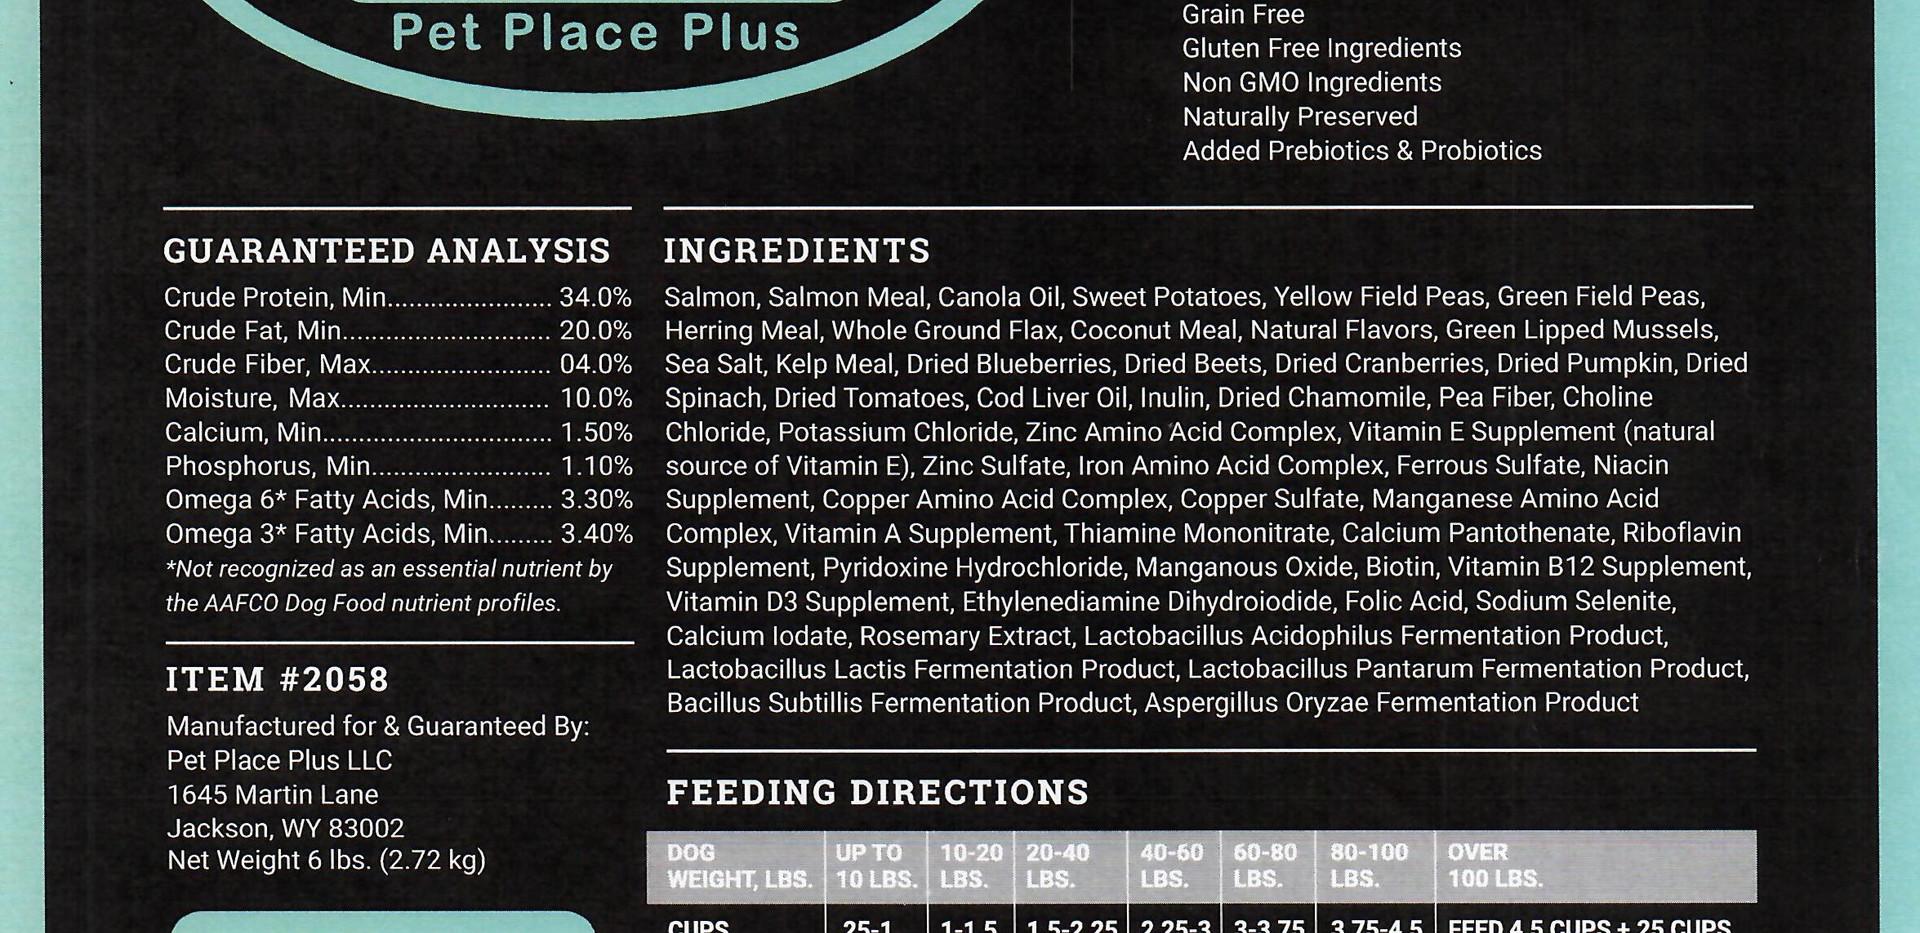 Vision Grain Free Salmon